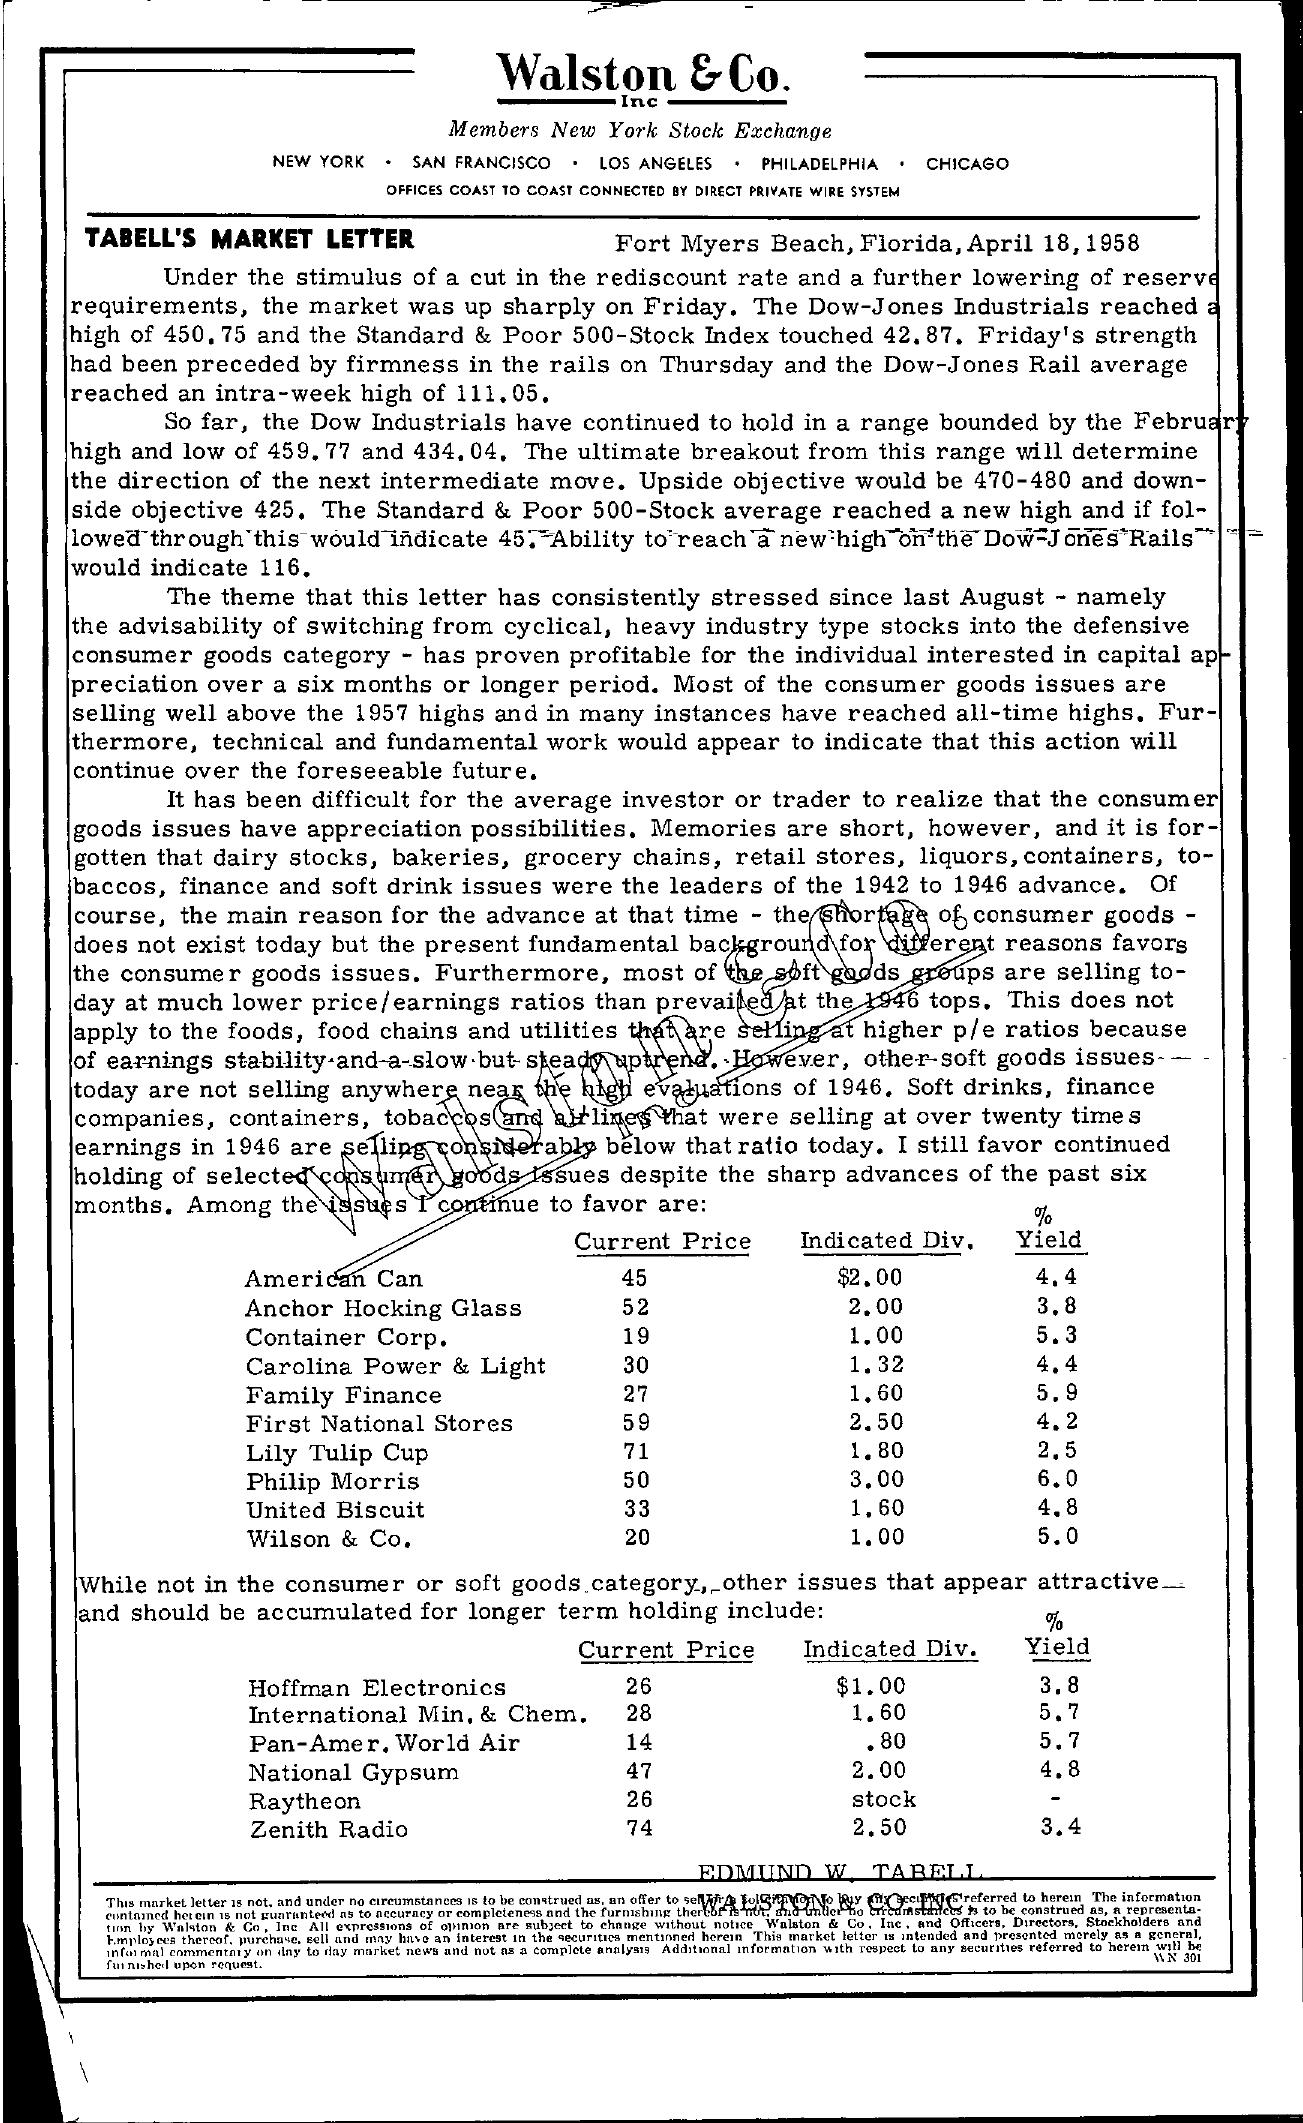 Tabell's Market Letter - April 18, 1958